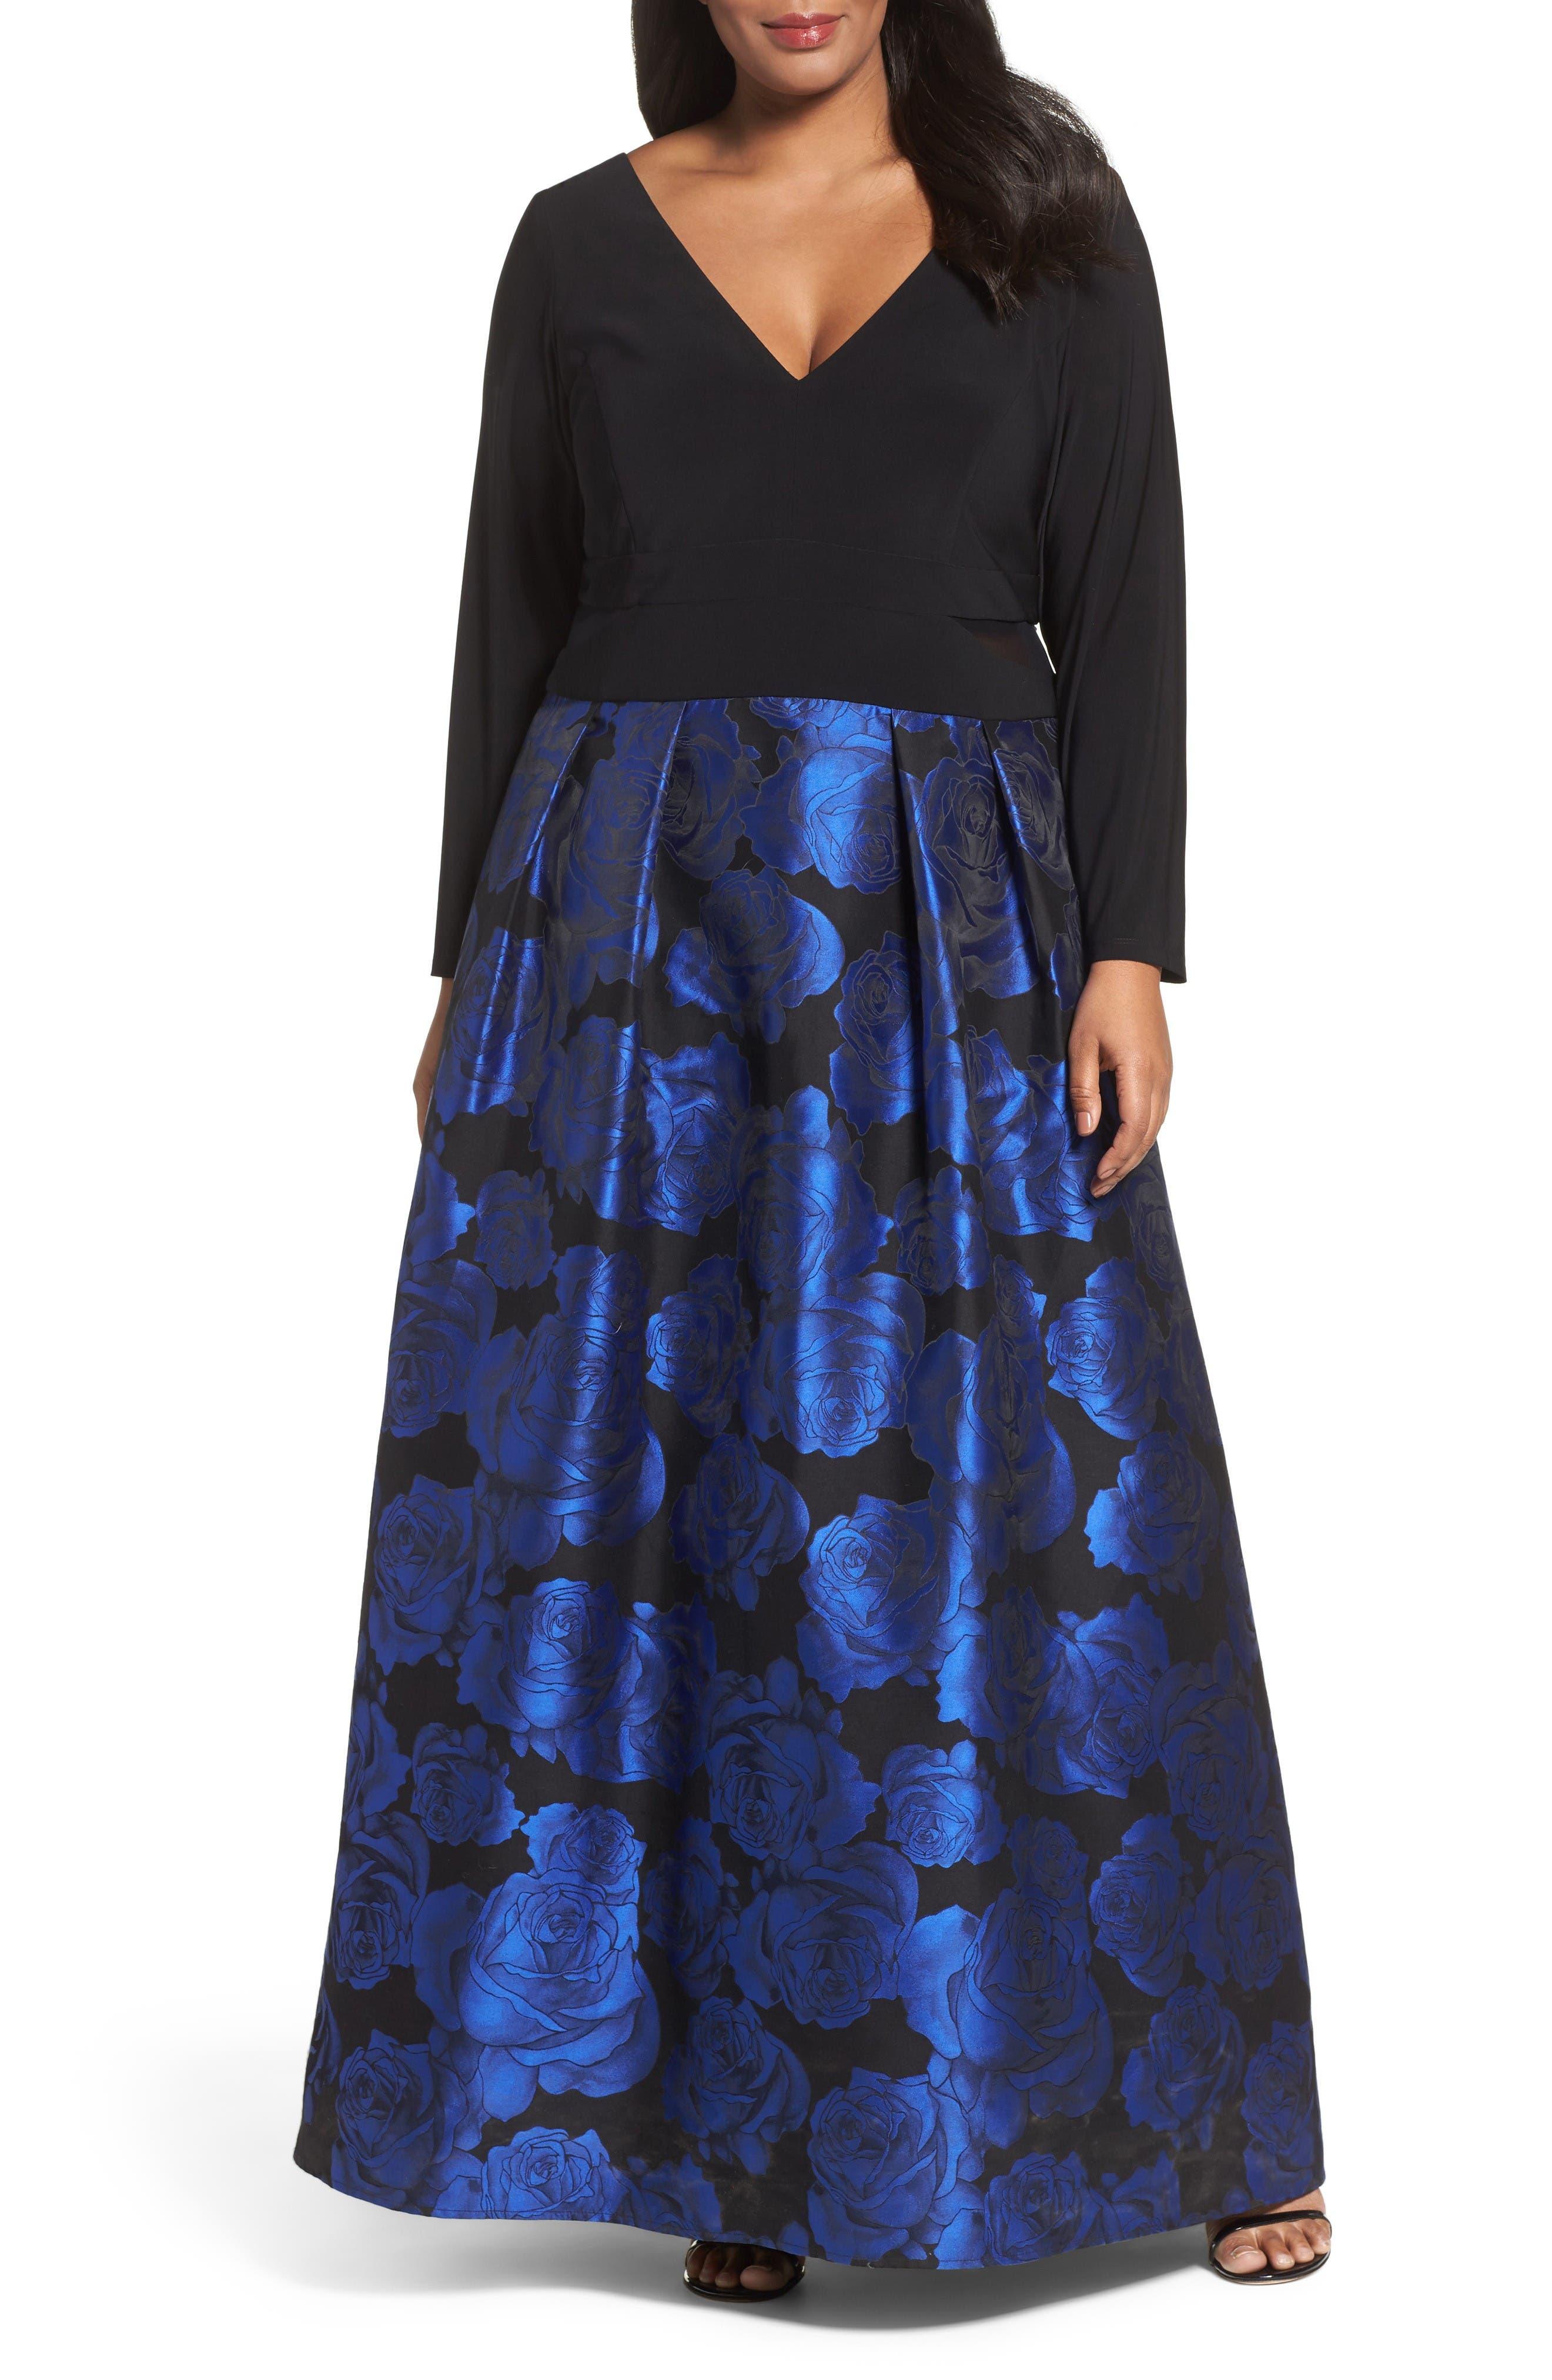 XSCAPE Evenings Brocade Gown